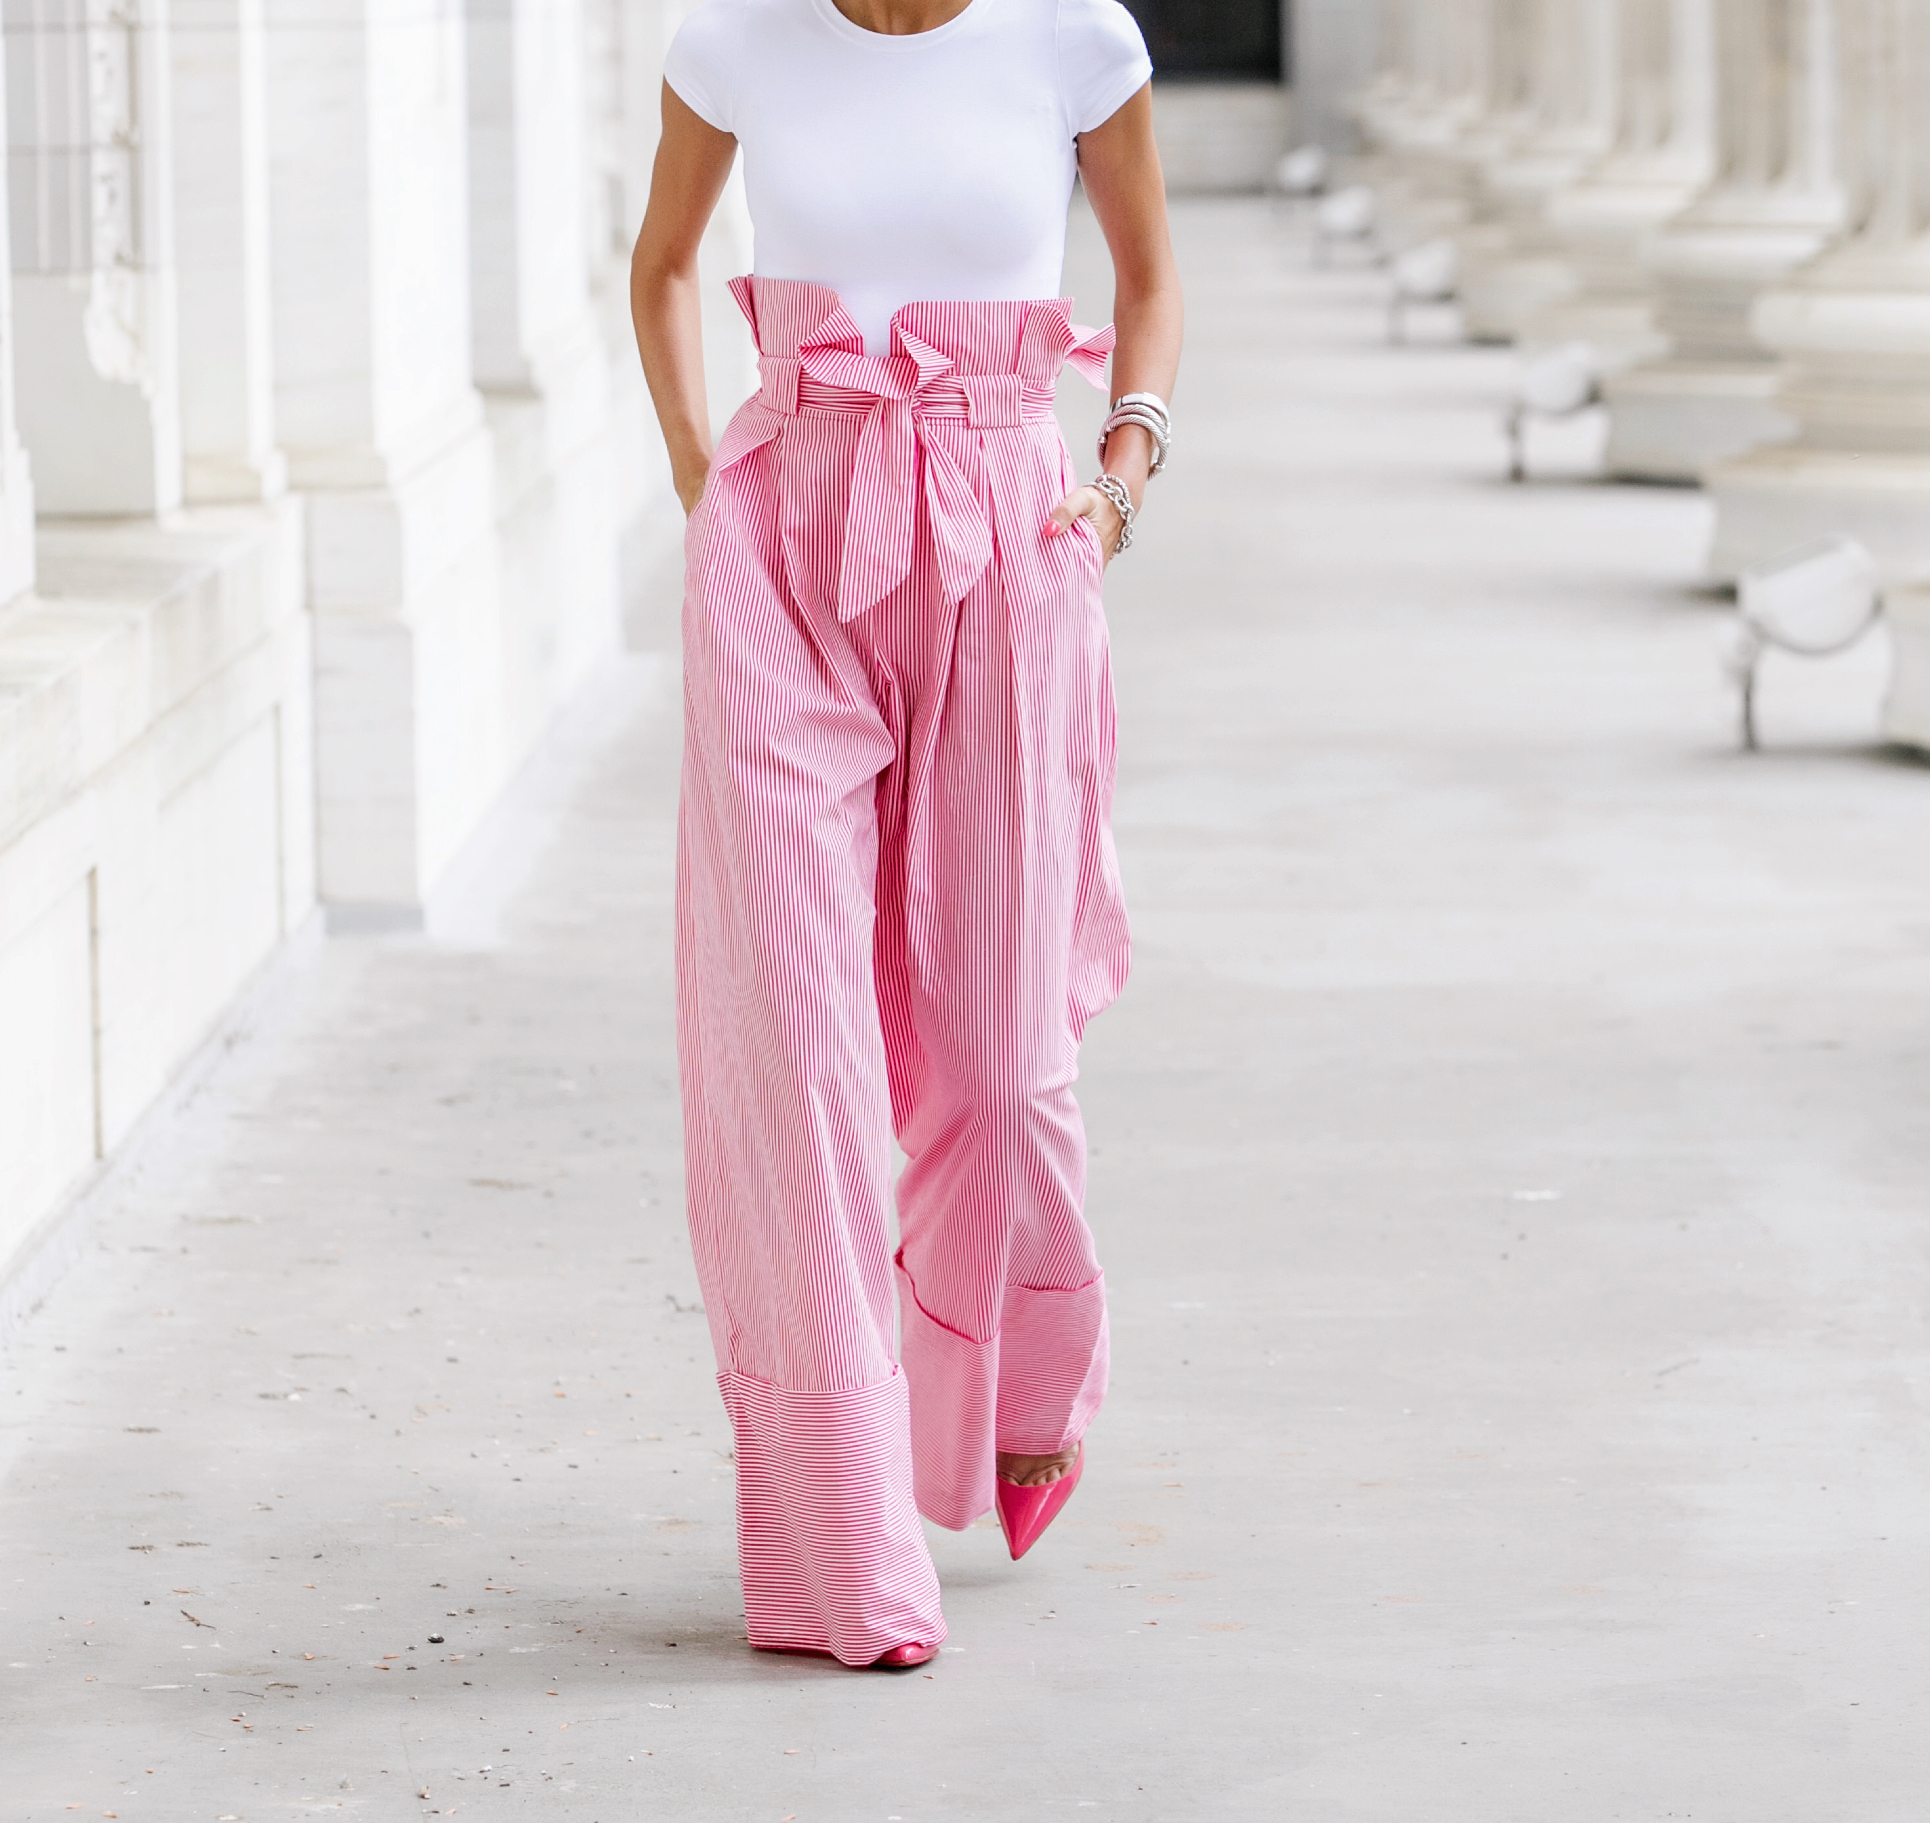 Trousers:Zara|Bodysuit:Theory|Pumps:Christian Louboutin|Headband:Zara    Dino Petrocelli Photography